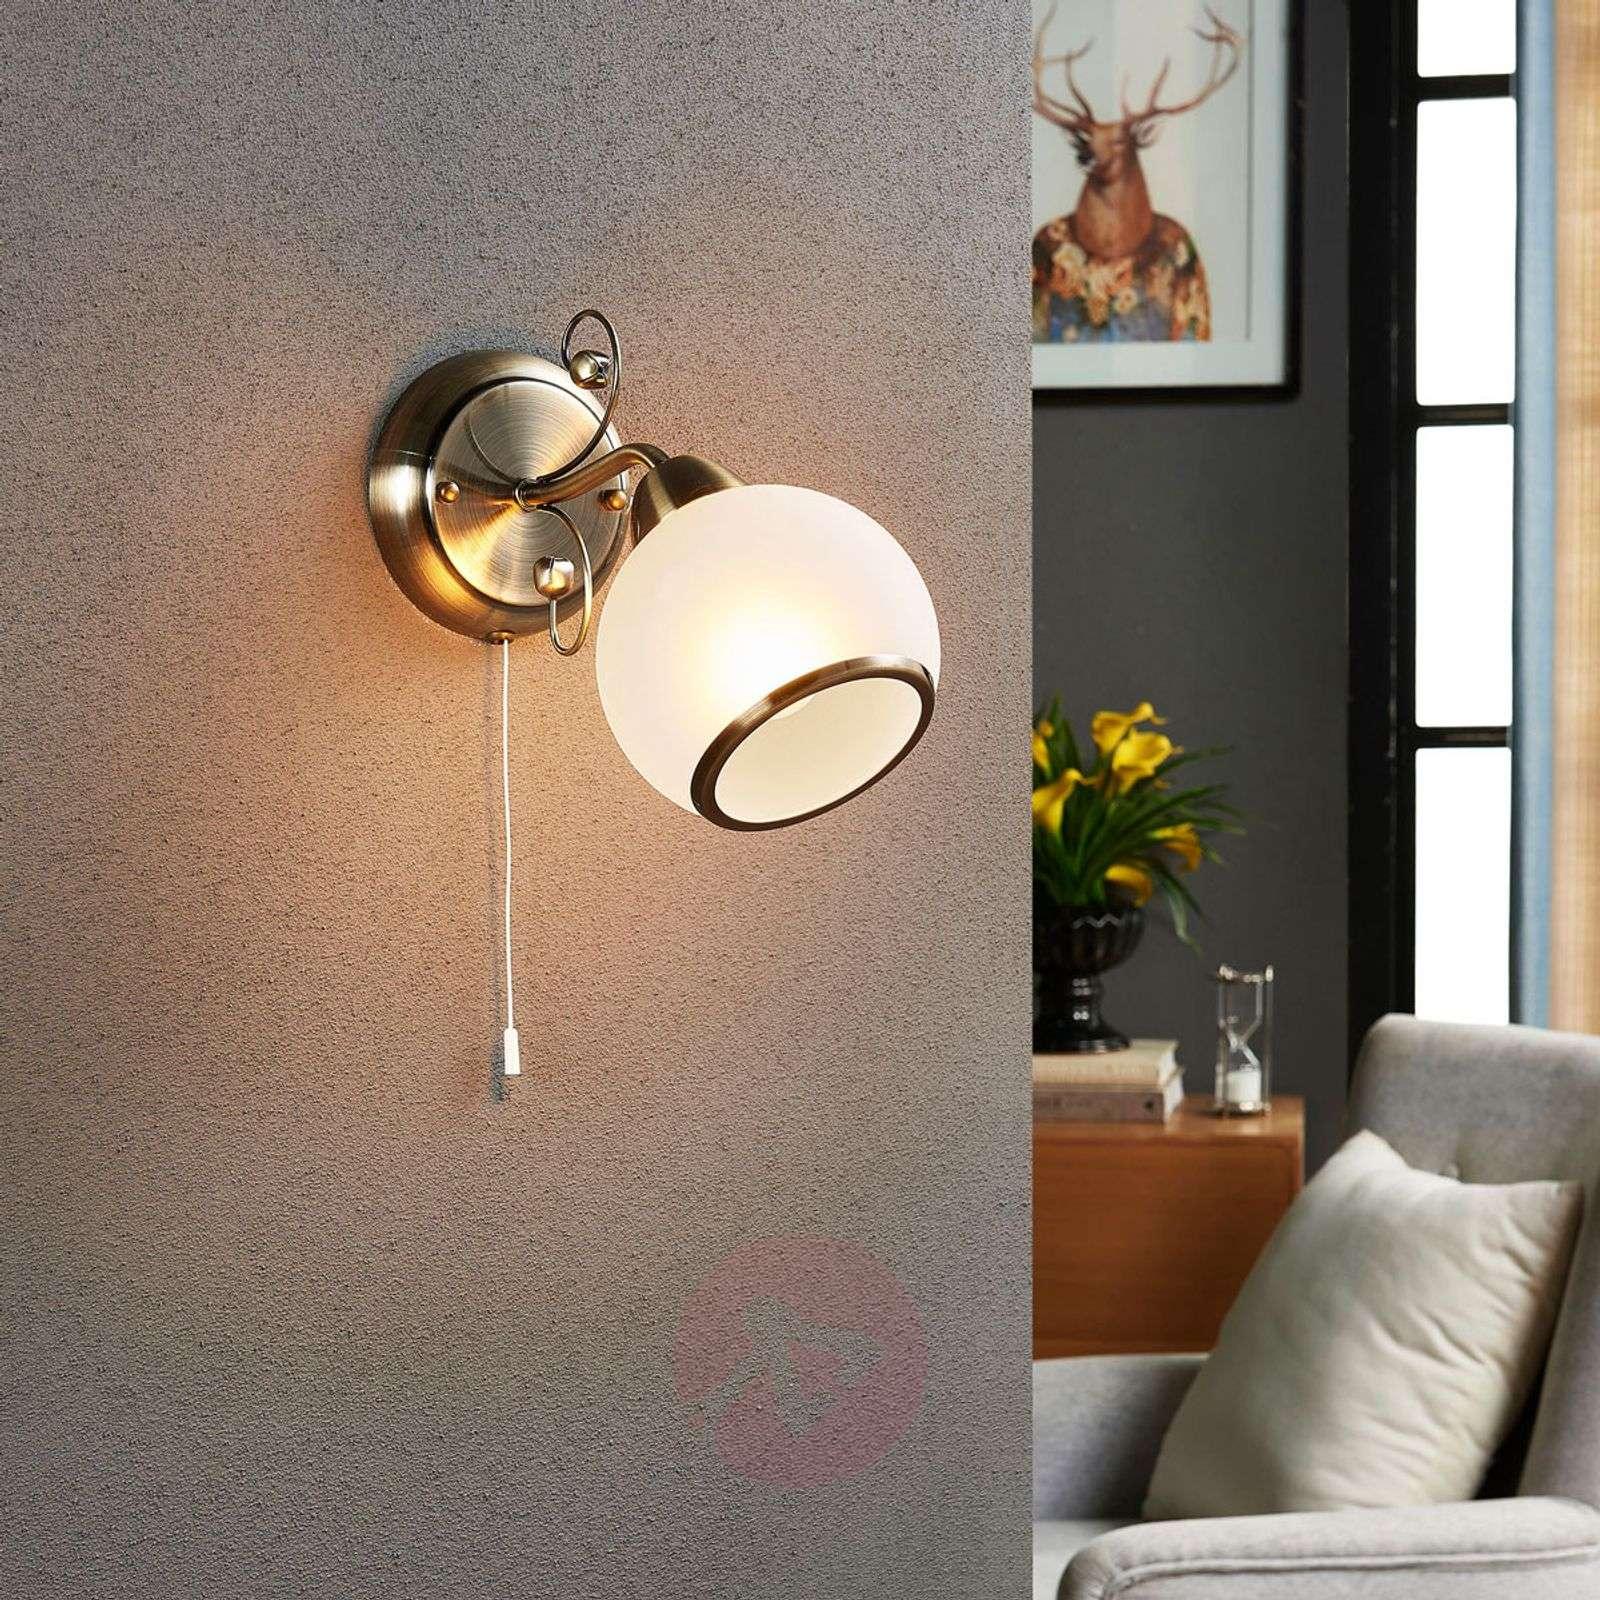 Enchanting wall lamp Corentin-9620751-01